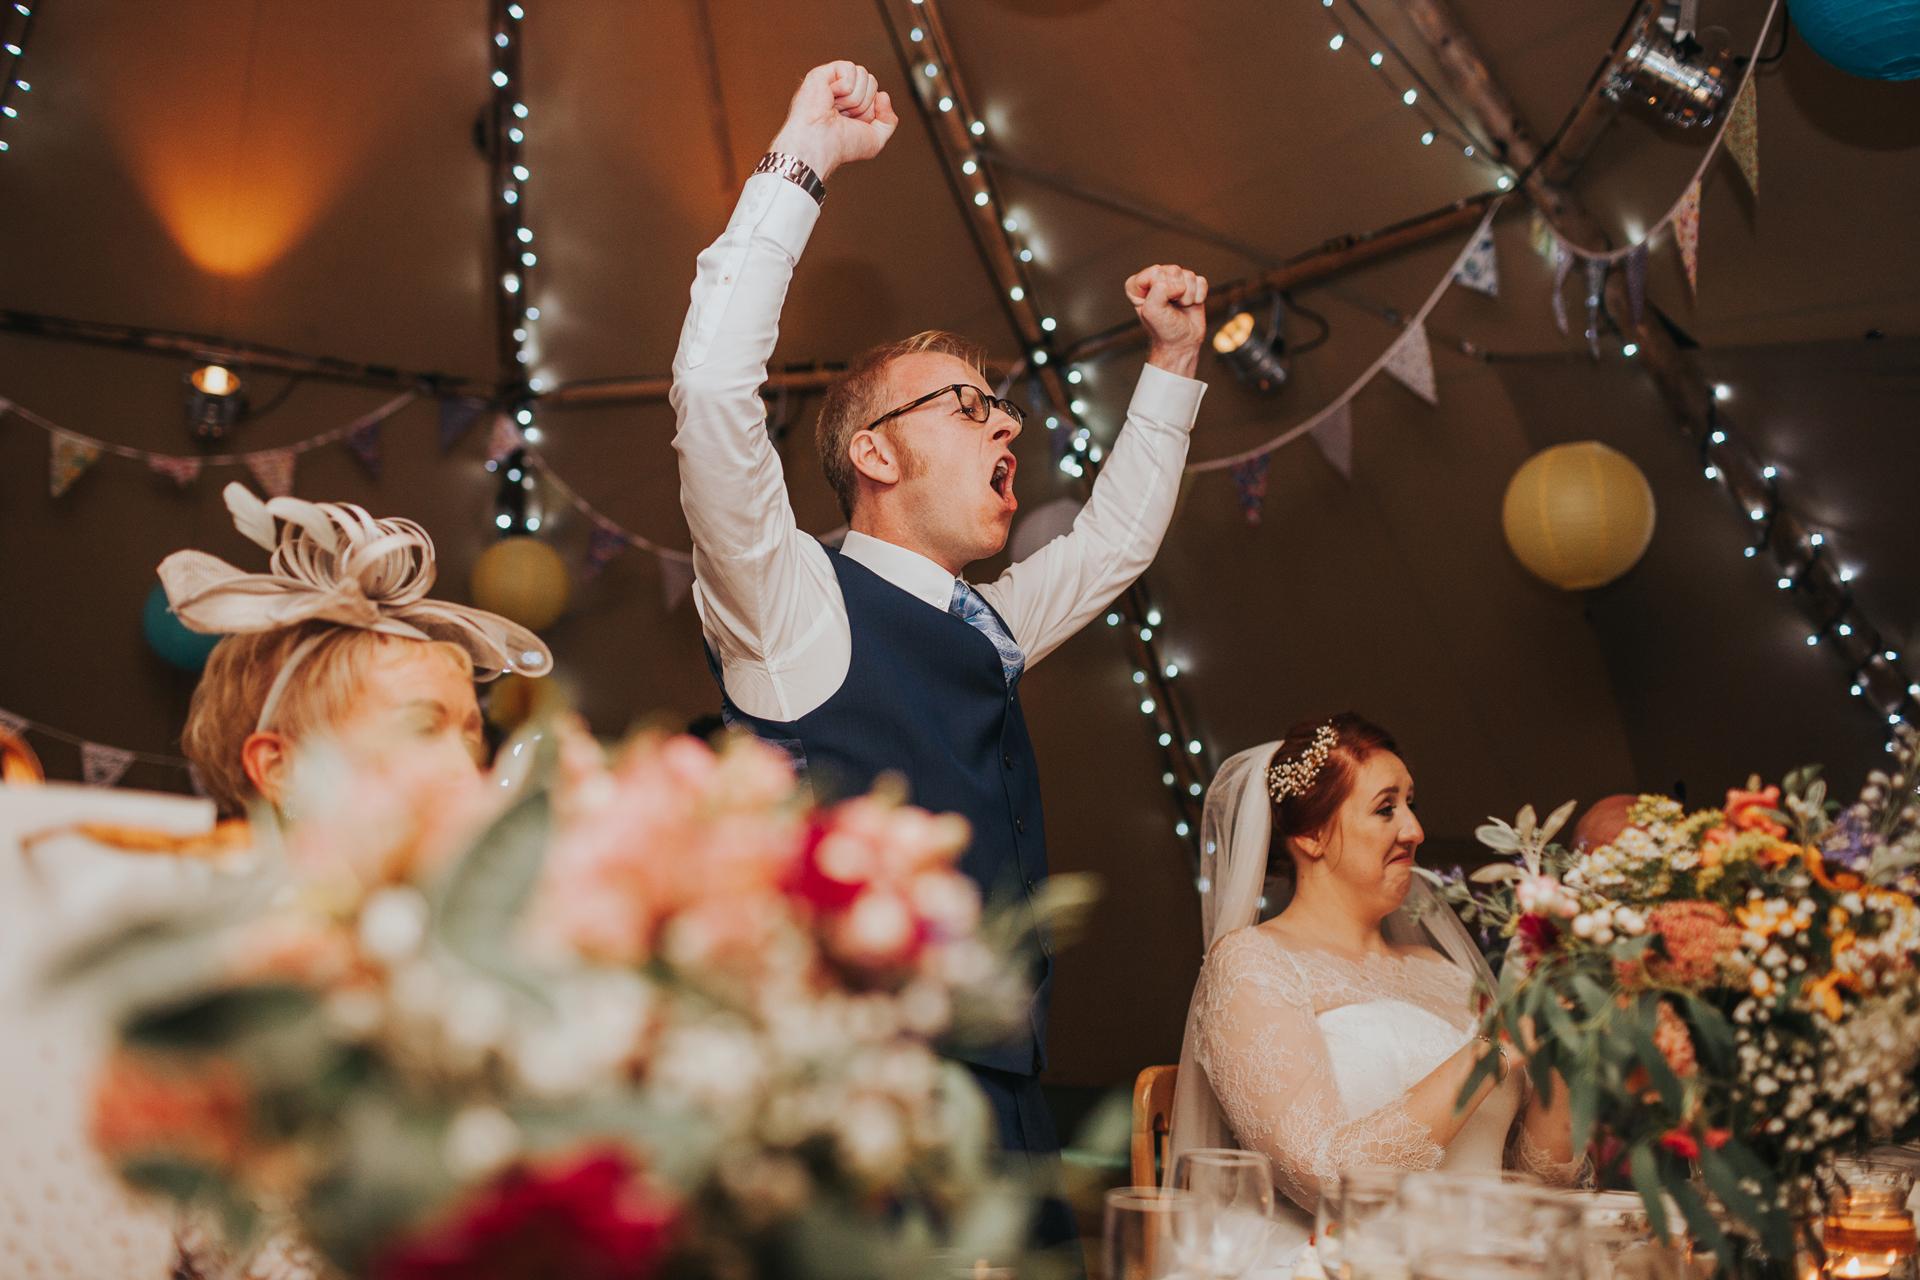 The groom cheering.